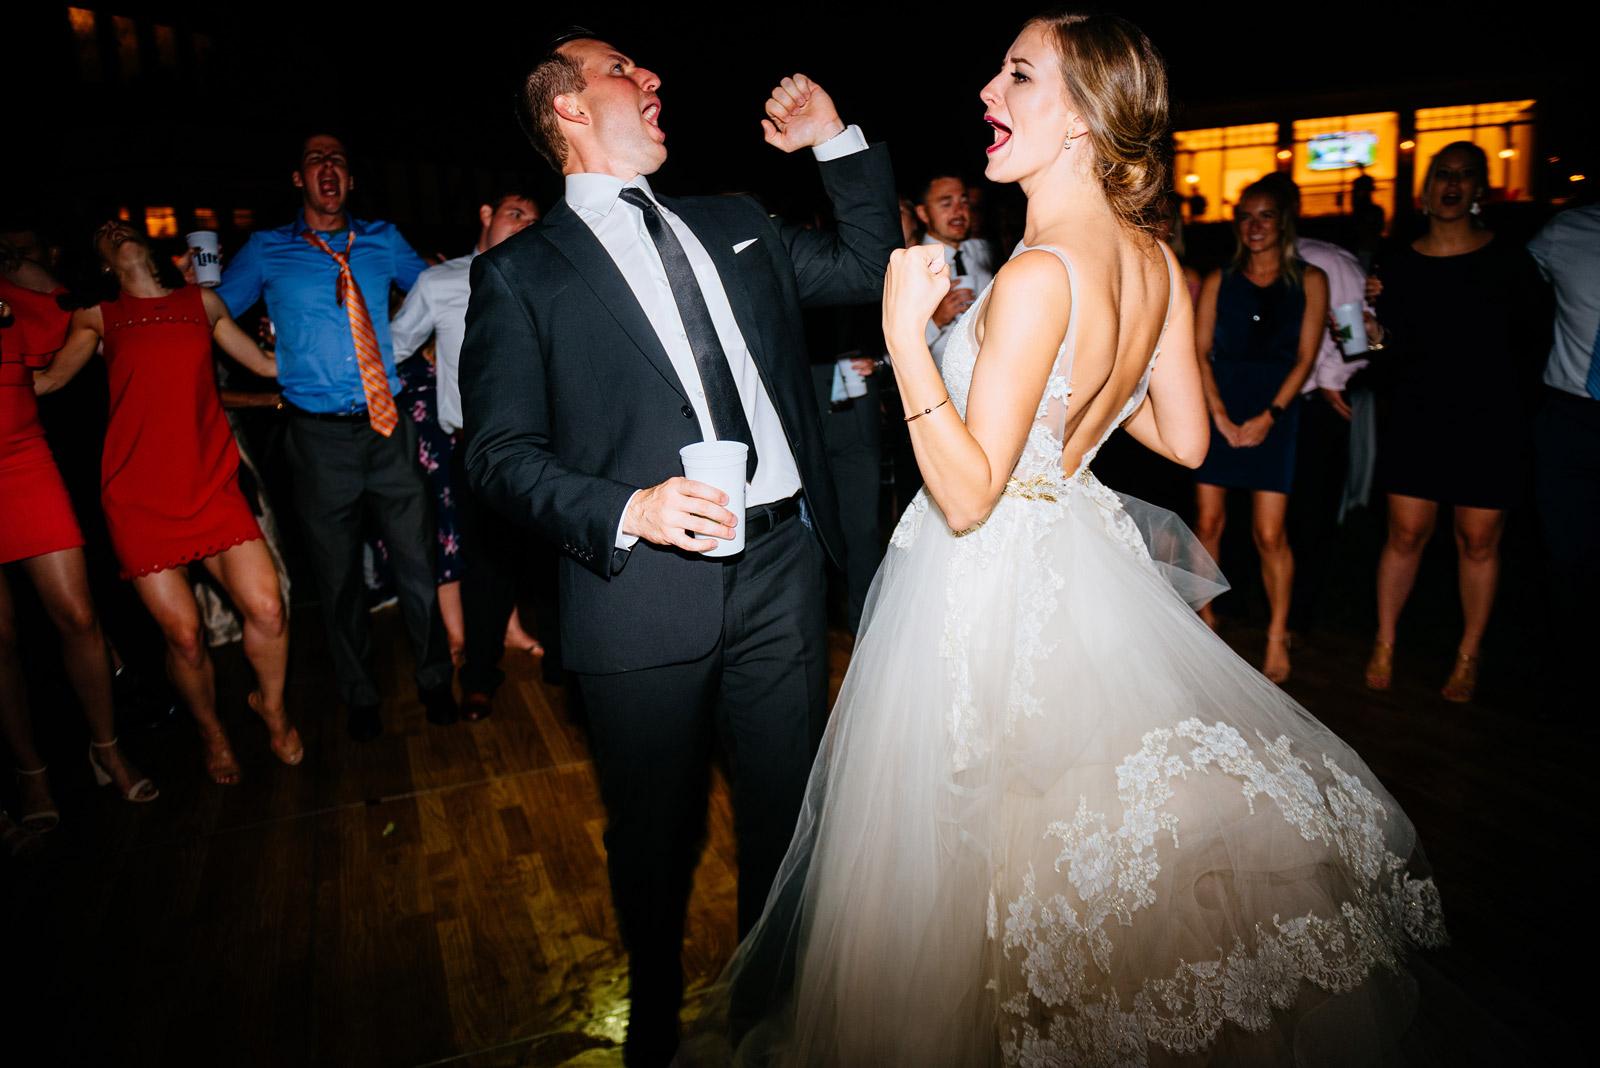 bride groom dancing zenner house wedding athens ohio